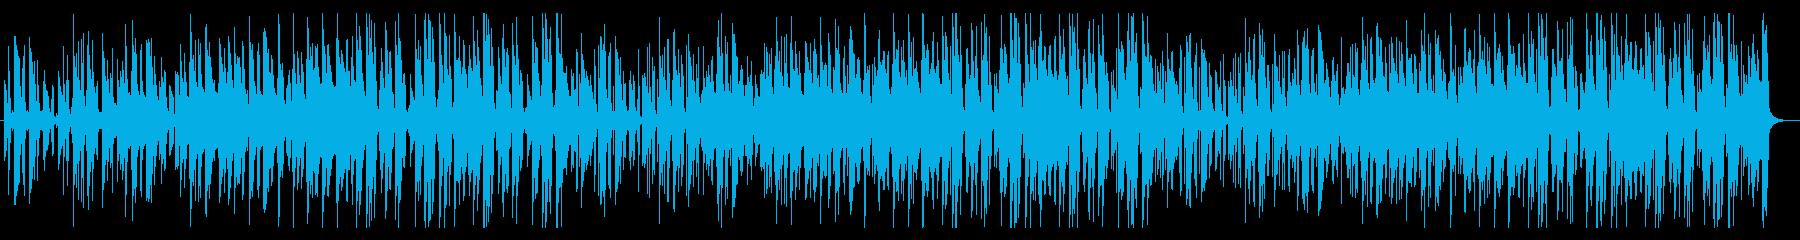 YouTube 鉄琴・ほのぼの・日常の再生済みの波形